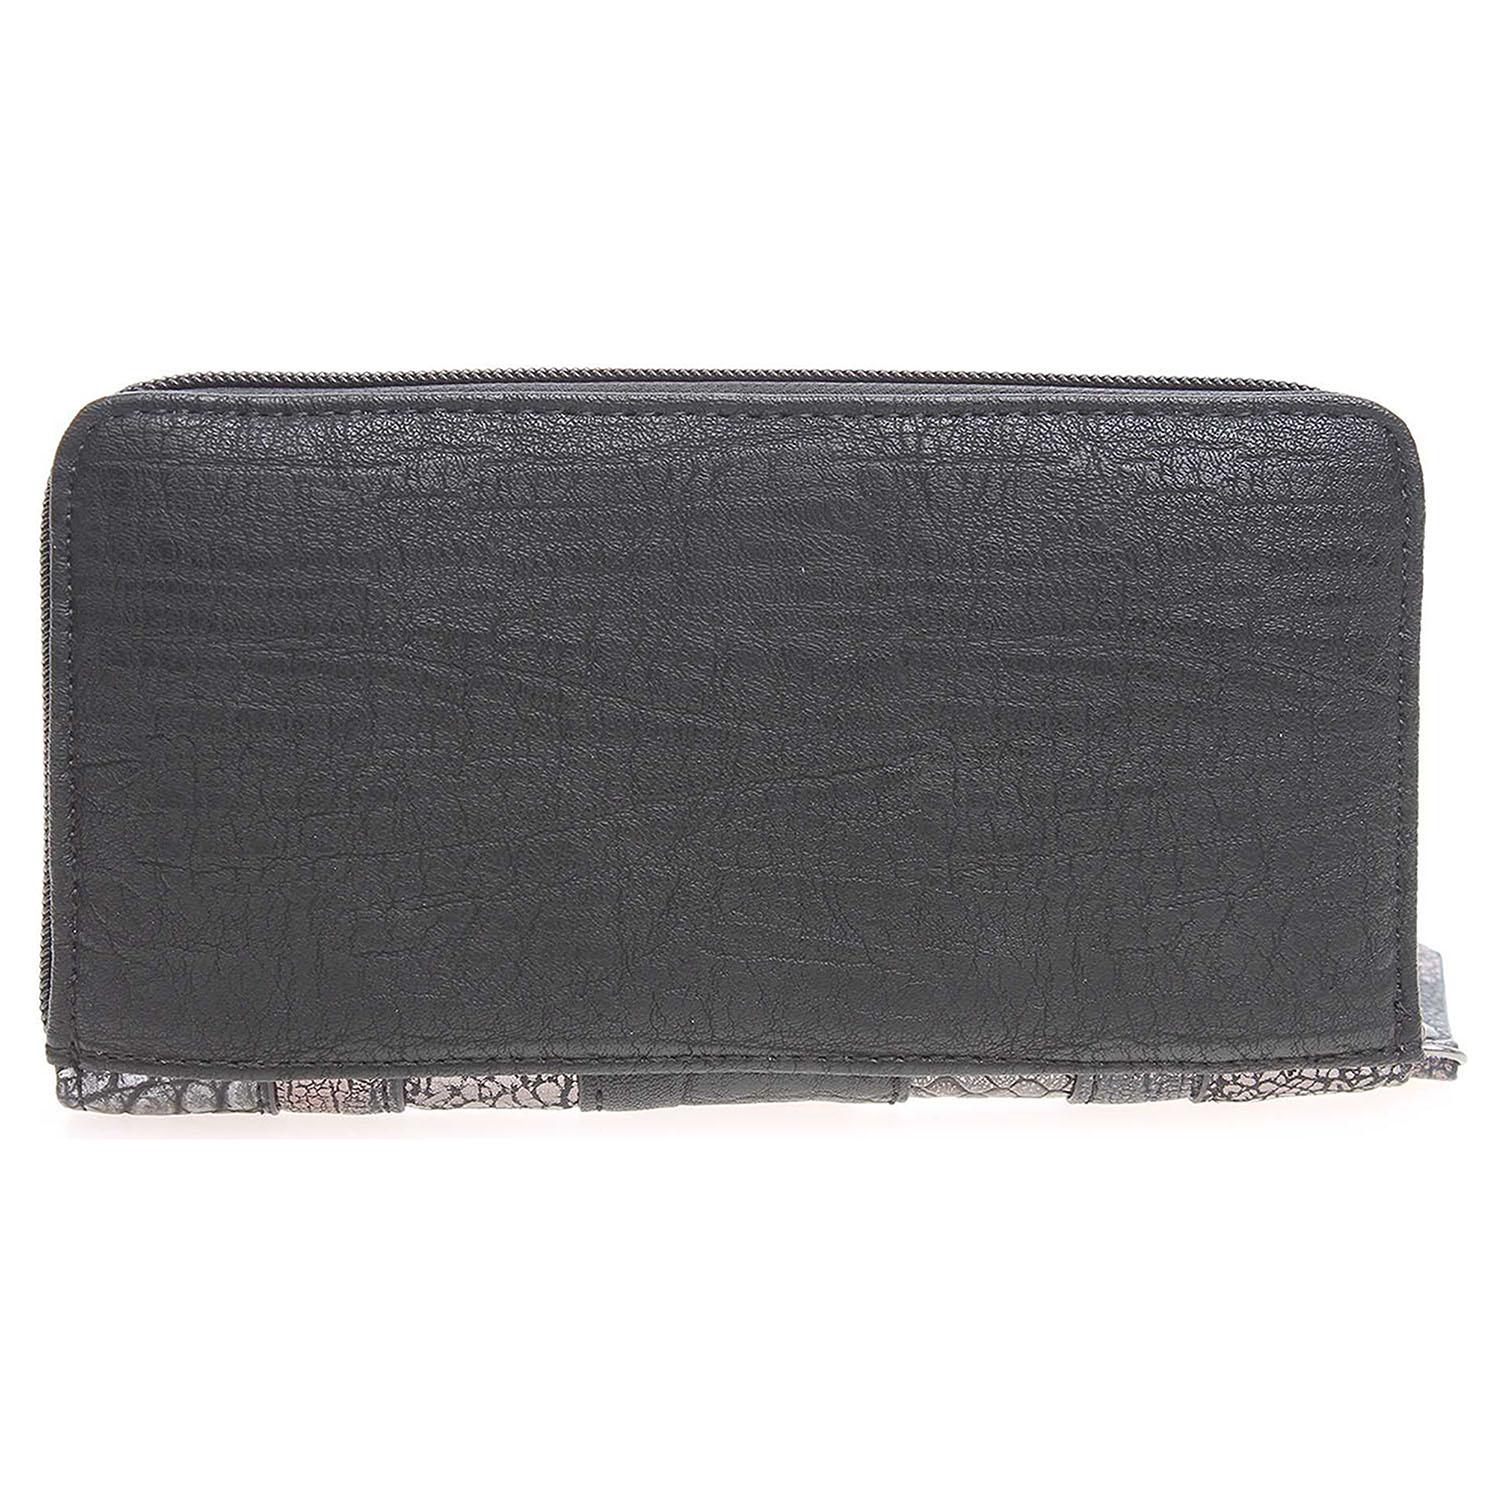 Ecco Gabor dámská peněženka 7720 60 černá-stříbrná 14200443